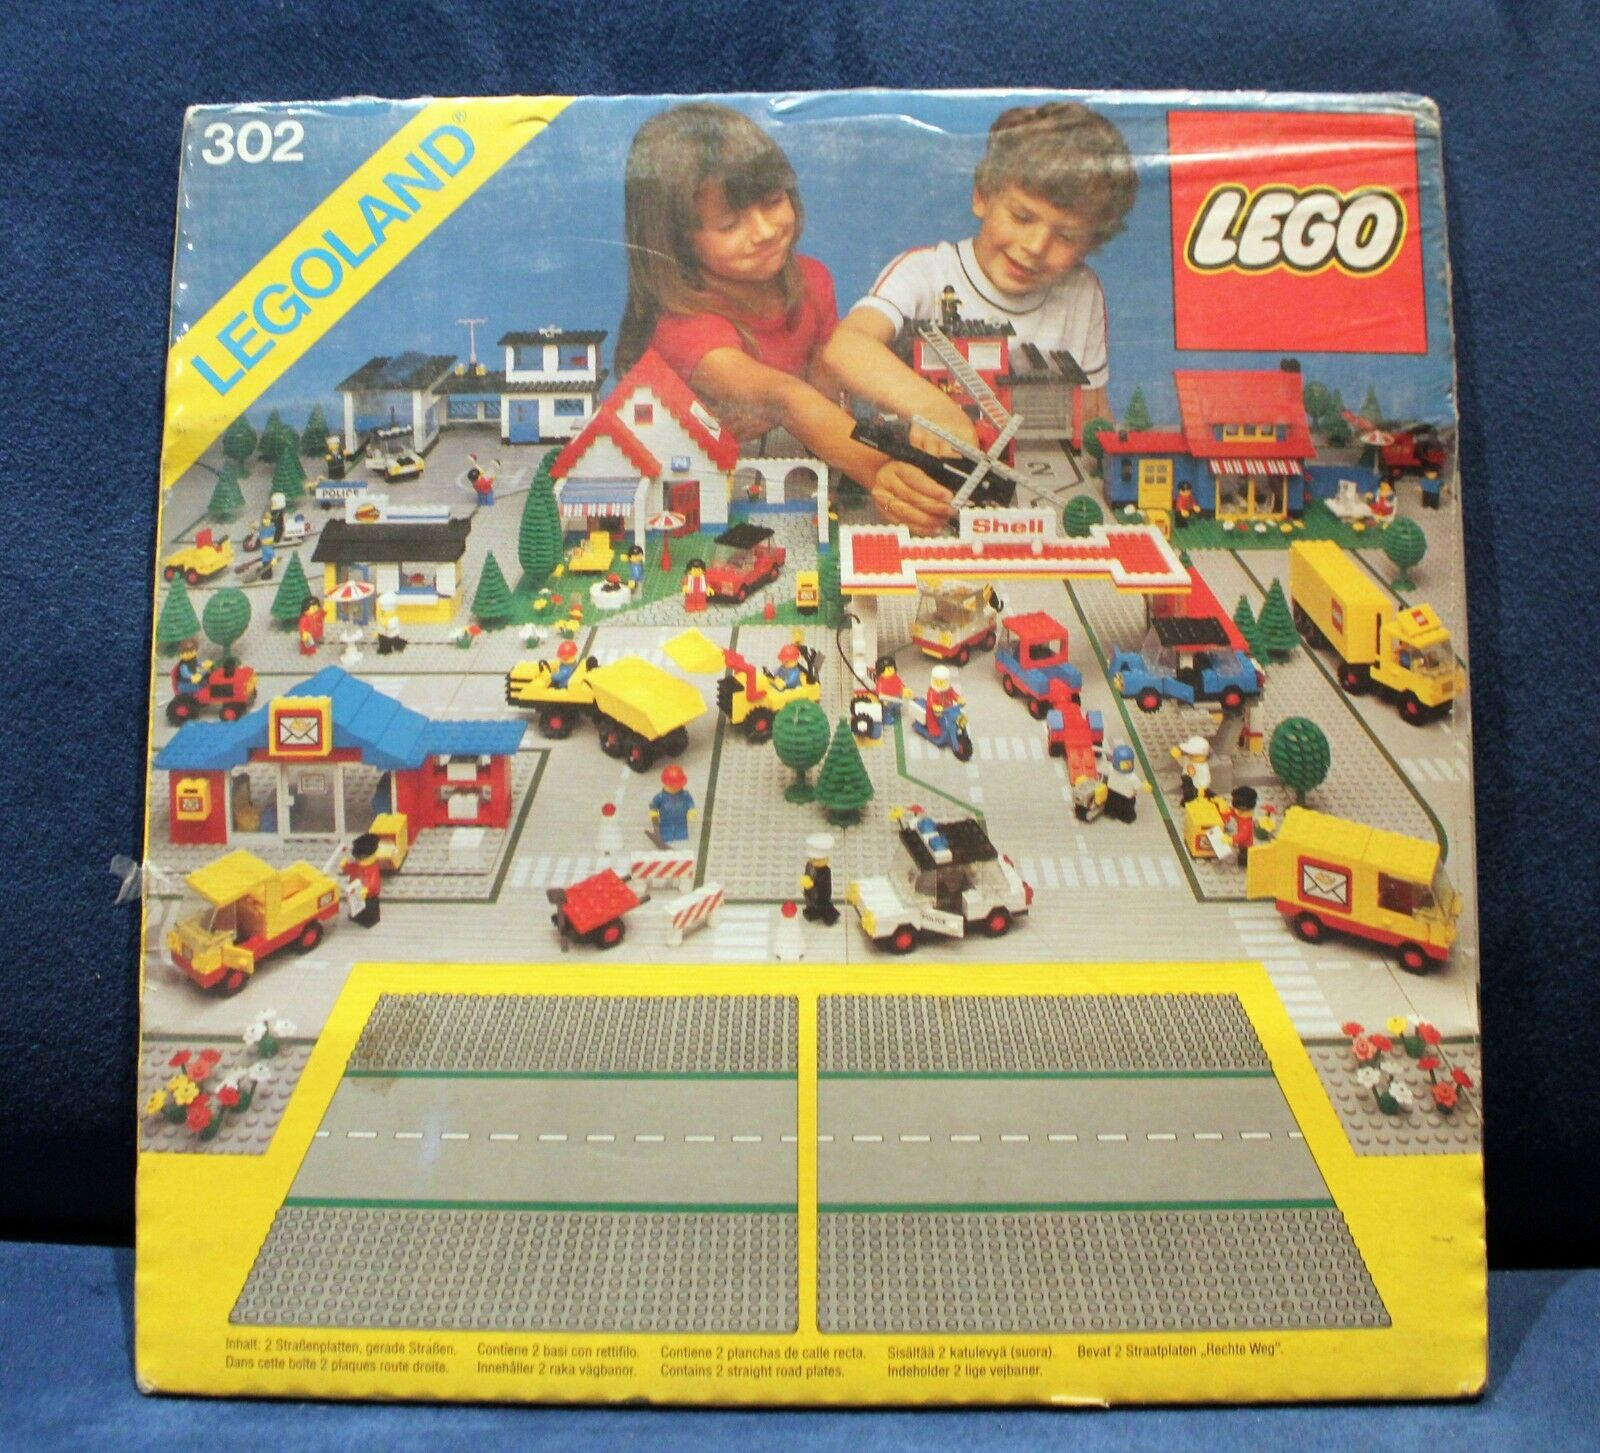 LEGO CITTA' CITY LEGOLAND 302 302 302 MISB VINTAGE 1983 2 BASI STRADE PLATES STREETS 1ea732